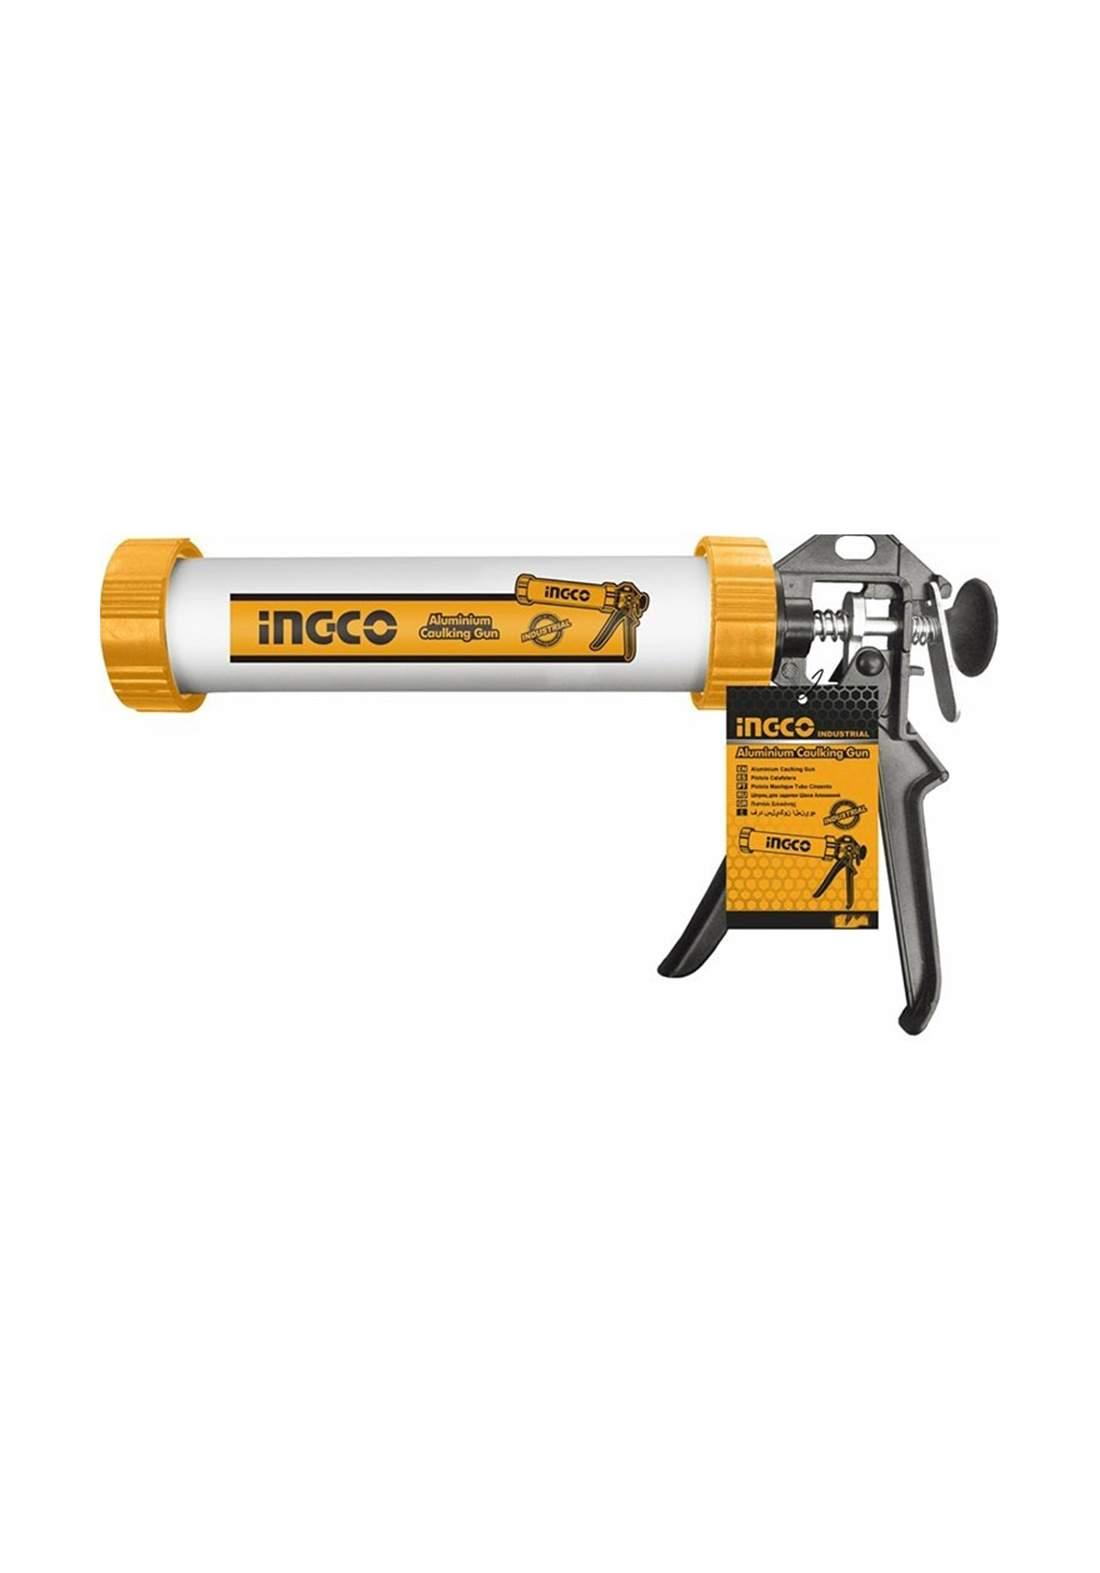 Ingco HCG0112 Aluminium caulking gun - 305MM مسدس سيلكون